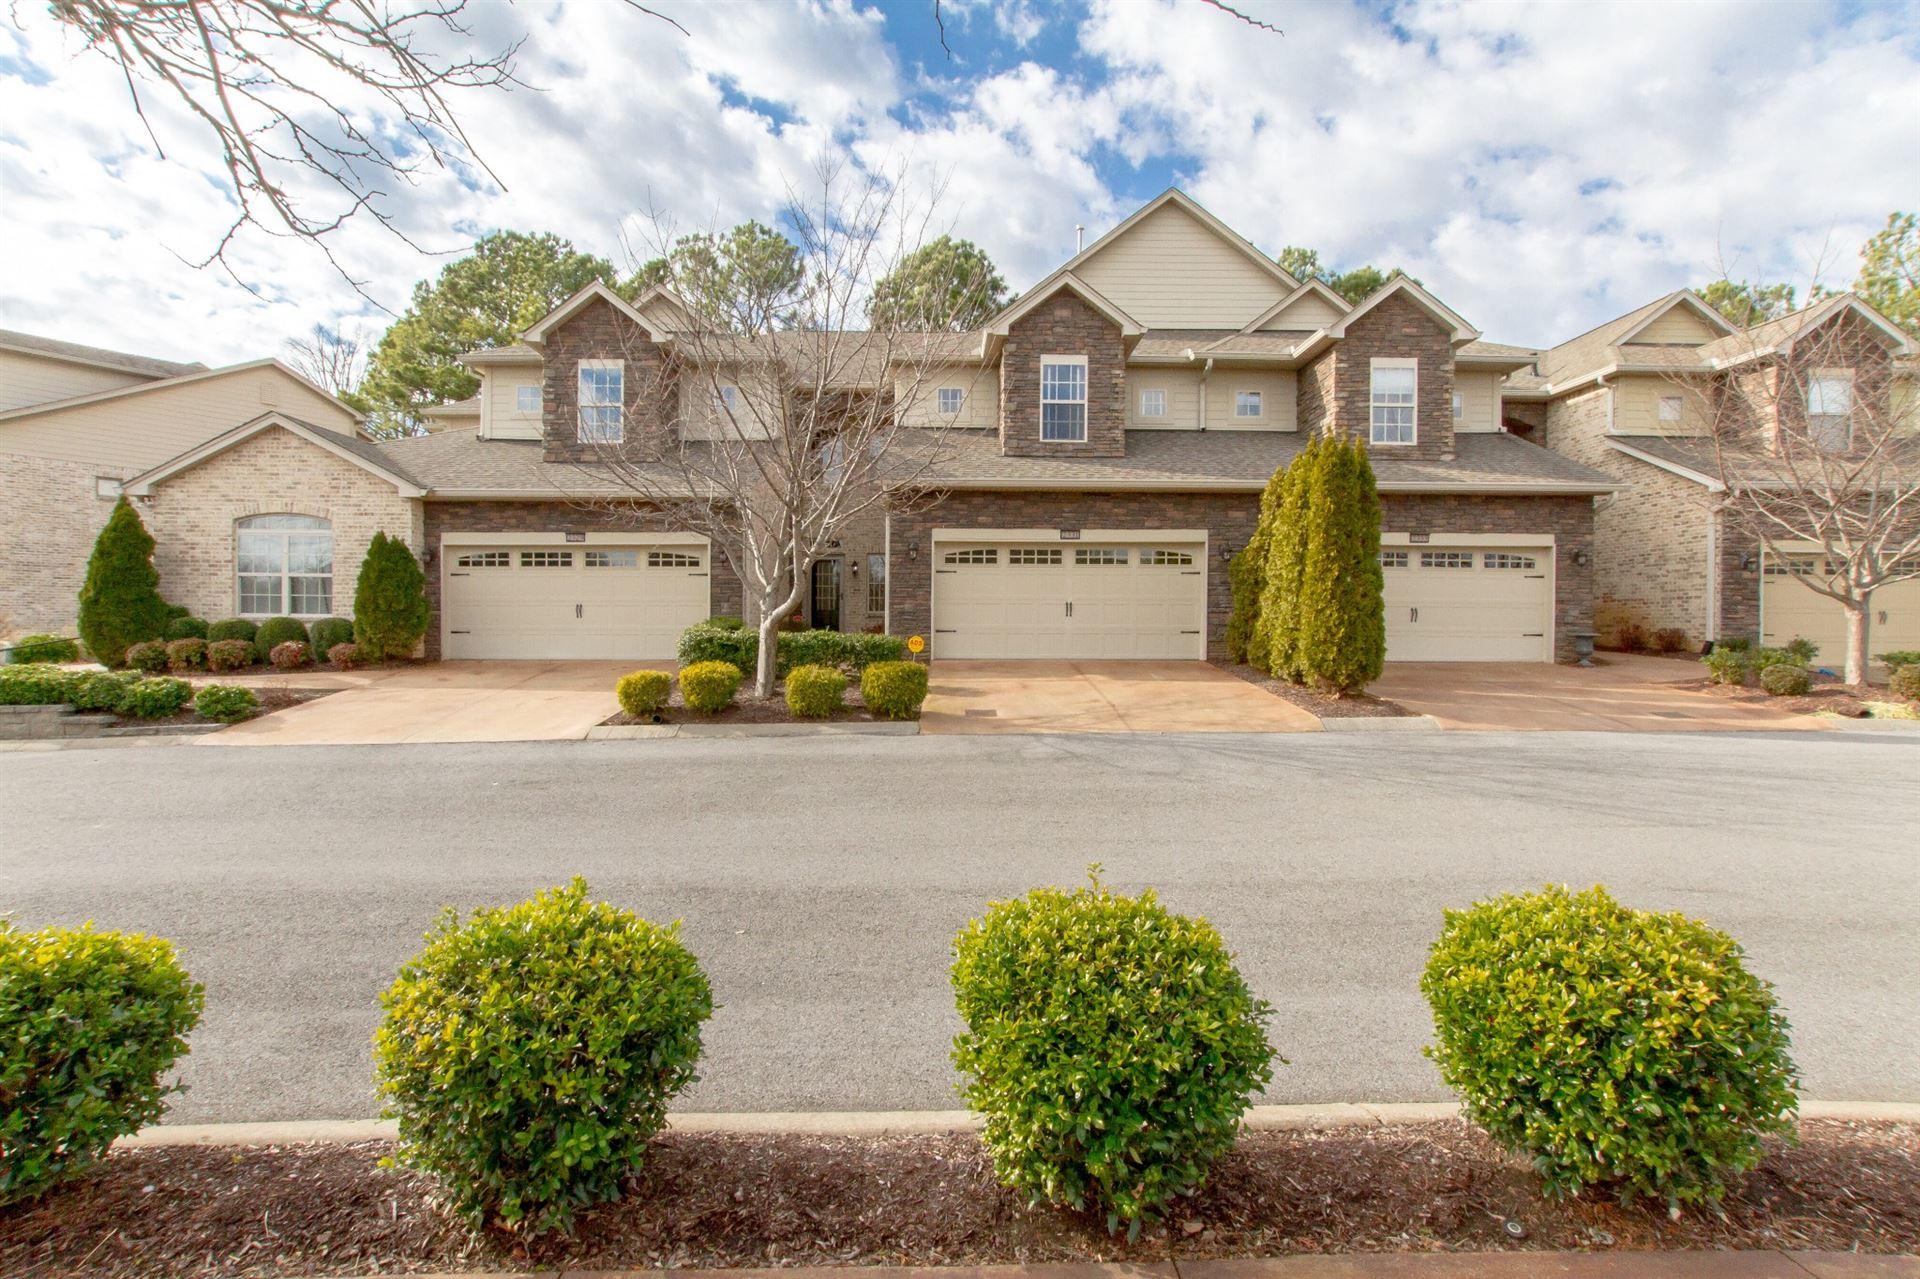 2331 River Terrace Dr, Murfreesboro, TN 37129 - MLS#: 2218252